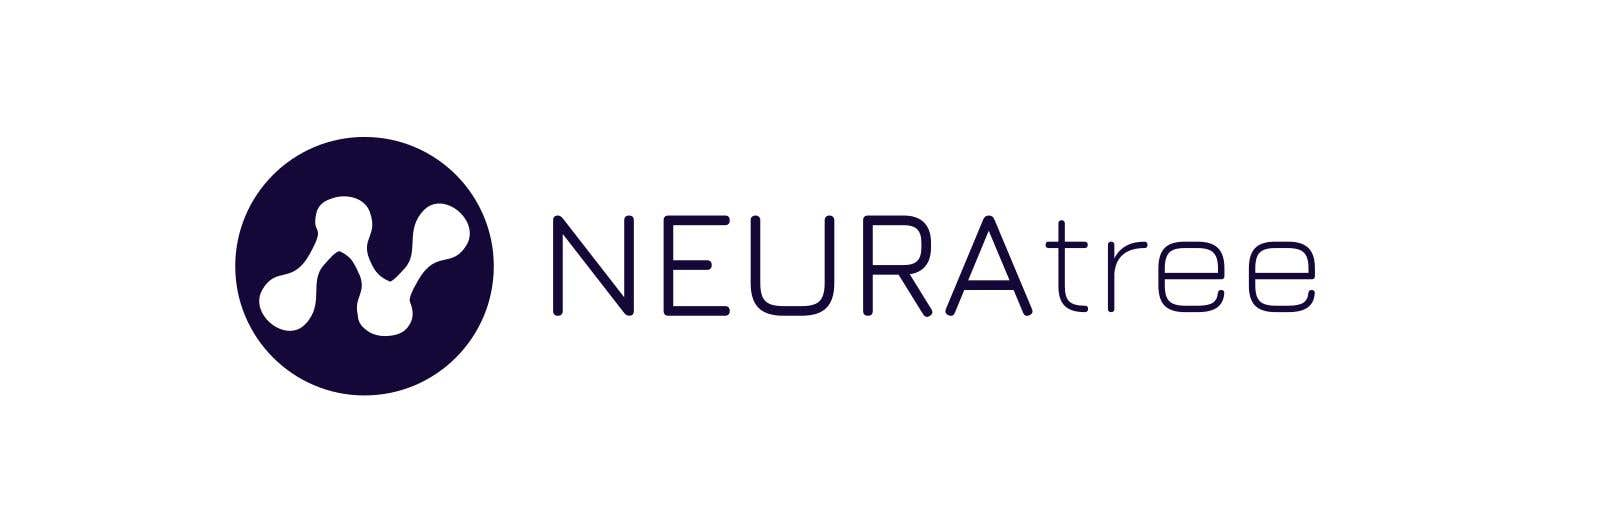 Penyertaan Peraduan #                                        101                                      untuk                                         Logo and Icon Design for a Technology Website (Neuratree) : Original logo